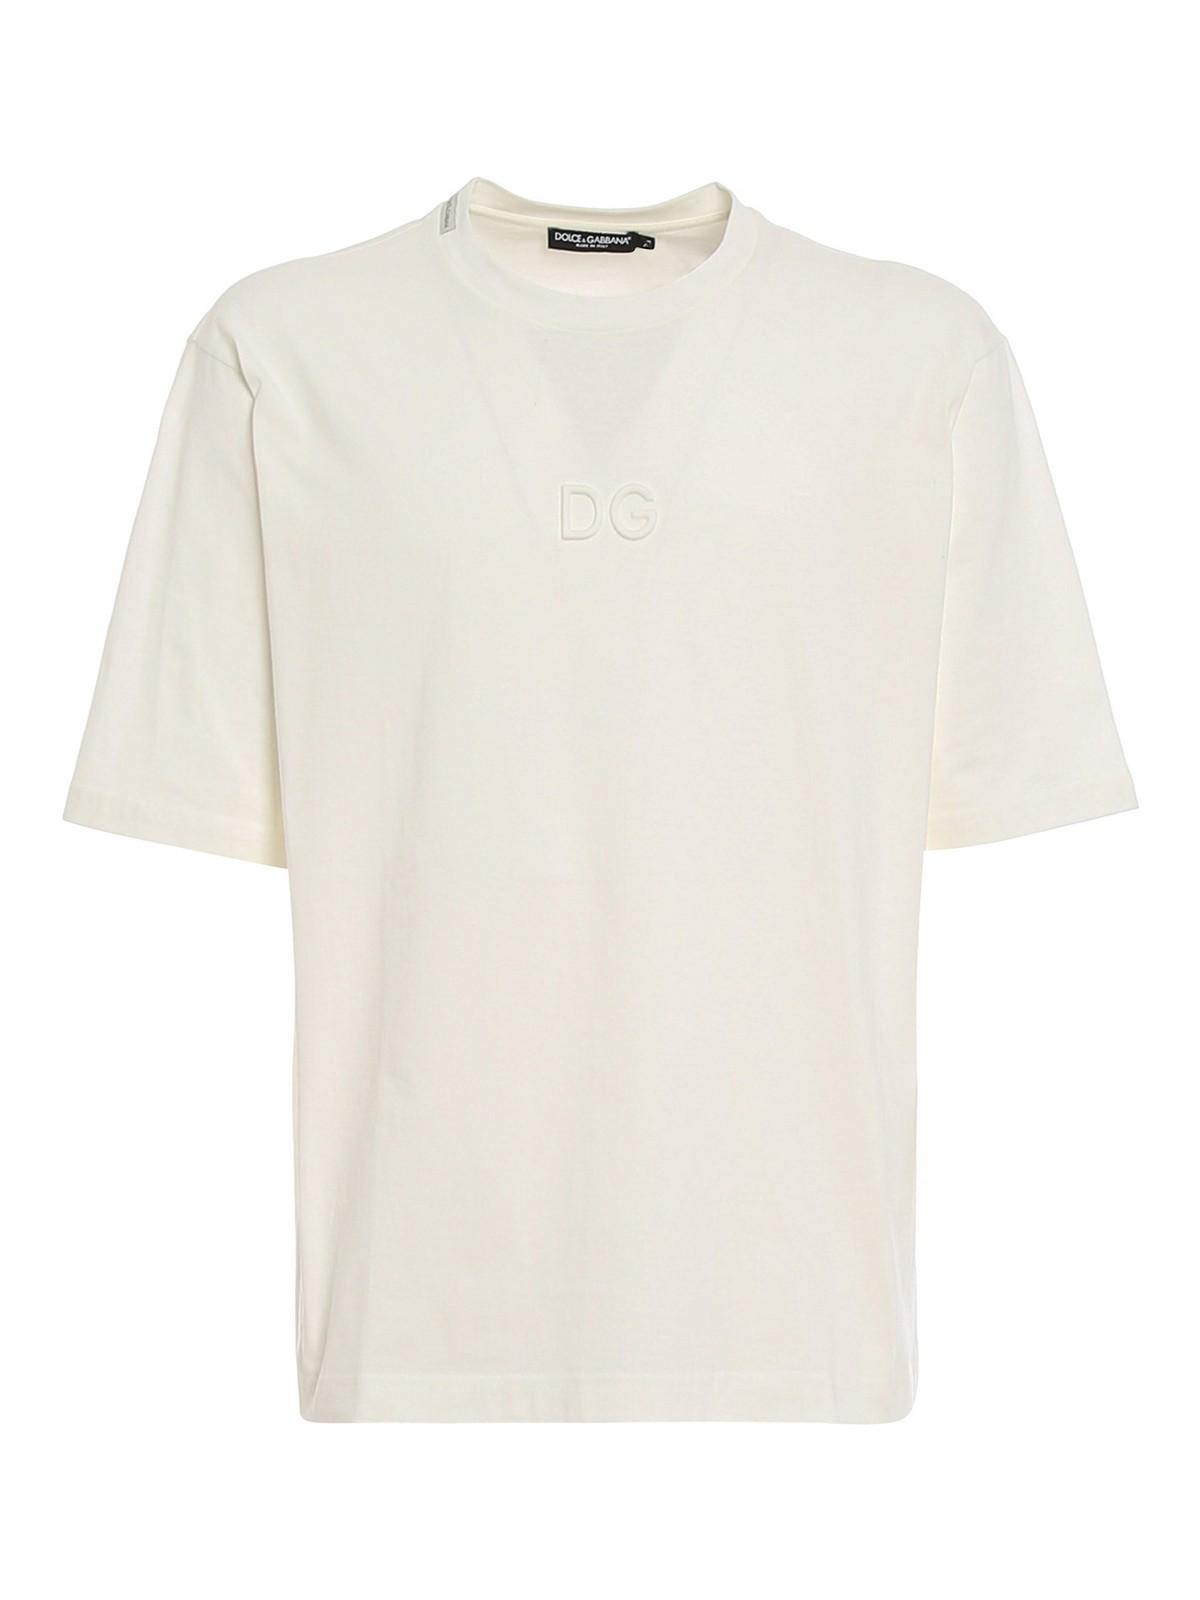 Dolce & Gabbana Cottons EMBOSSED LOGO T-SHIRT